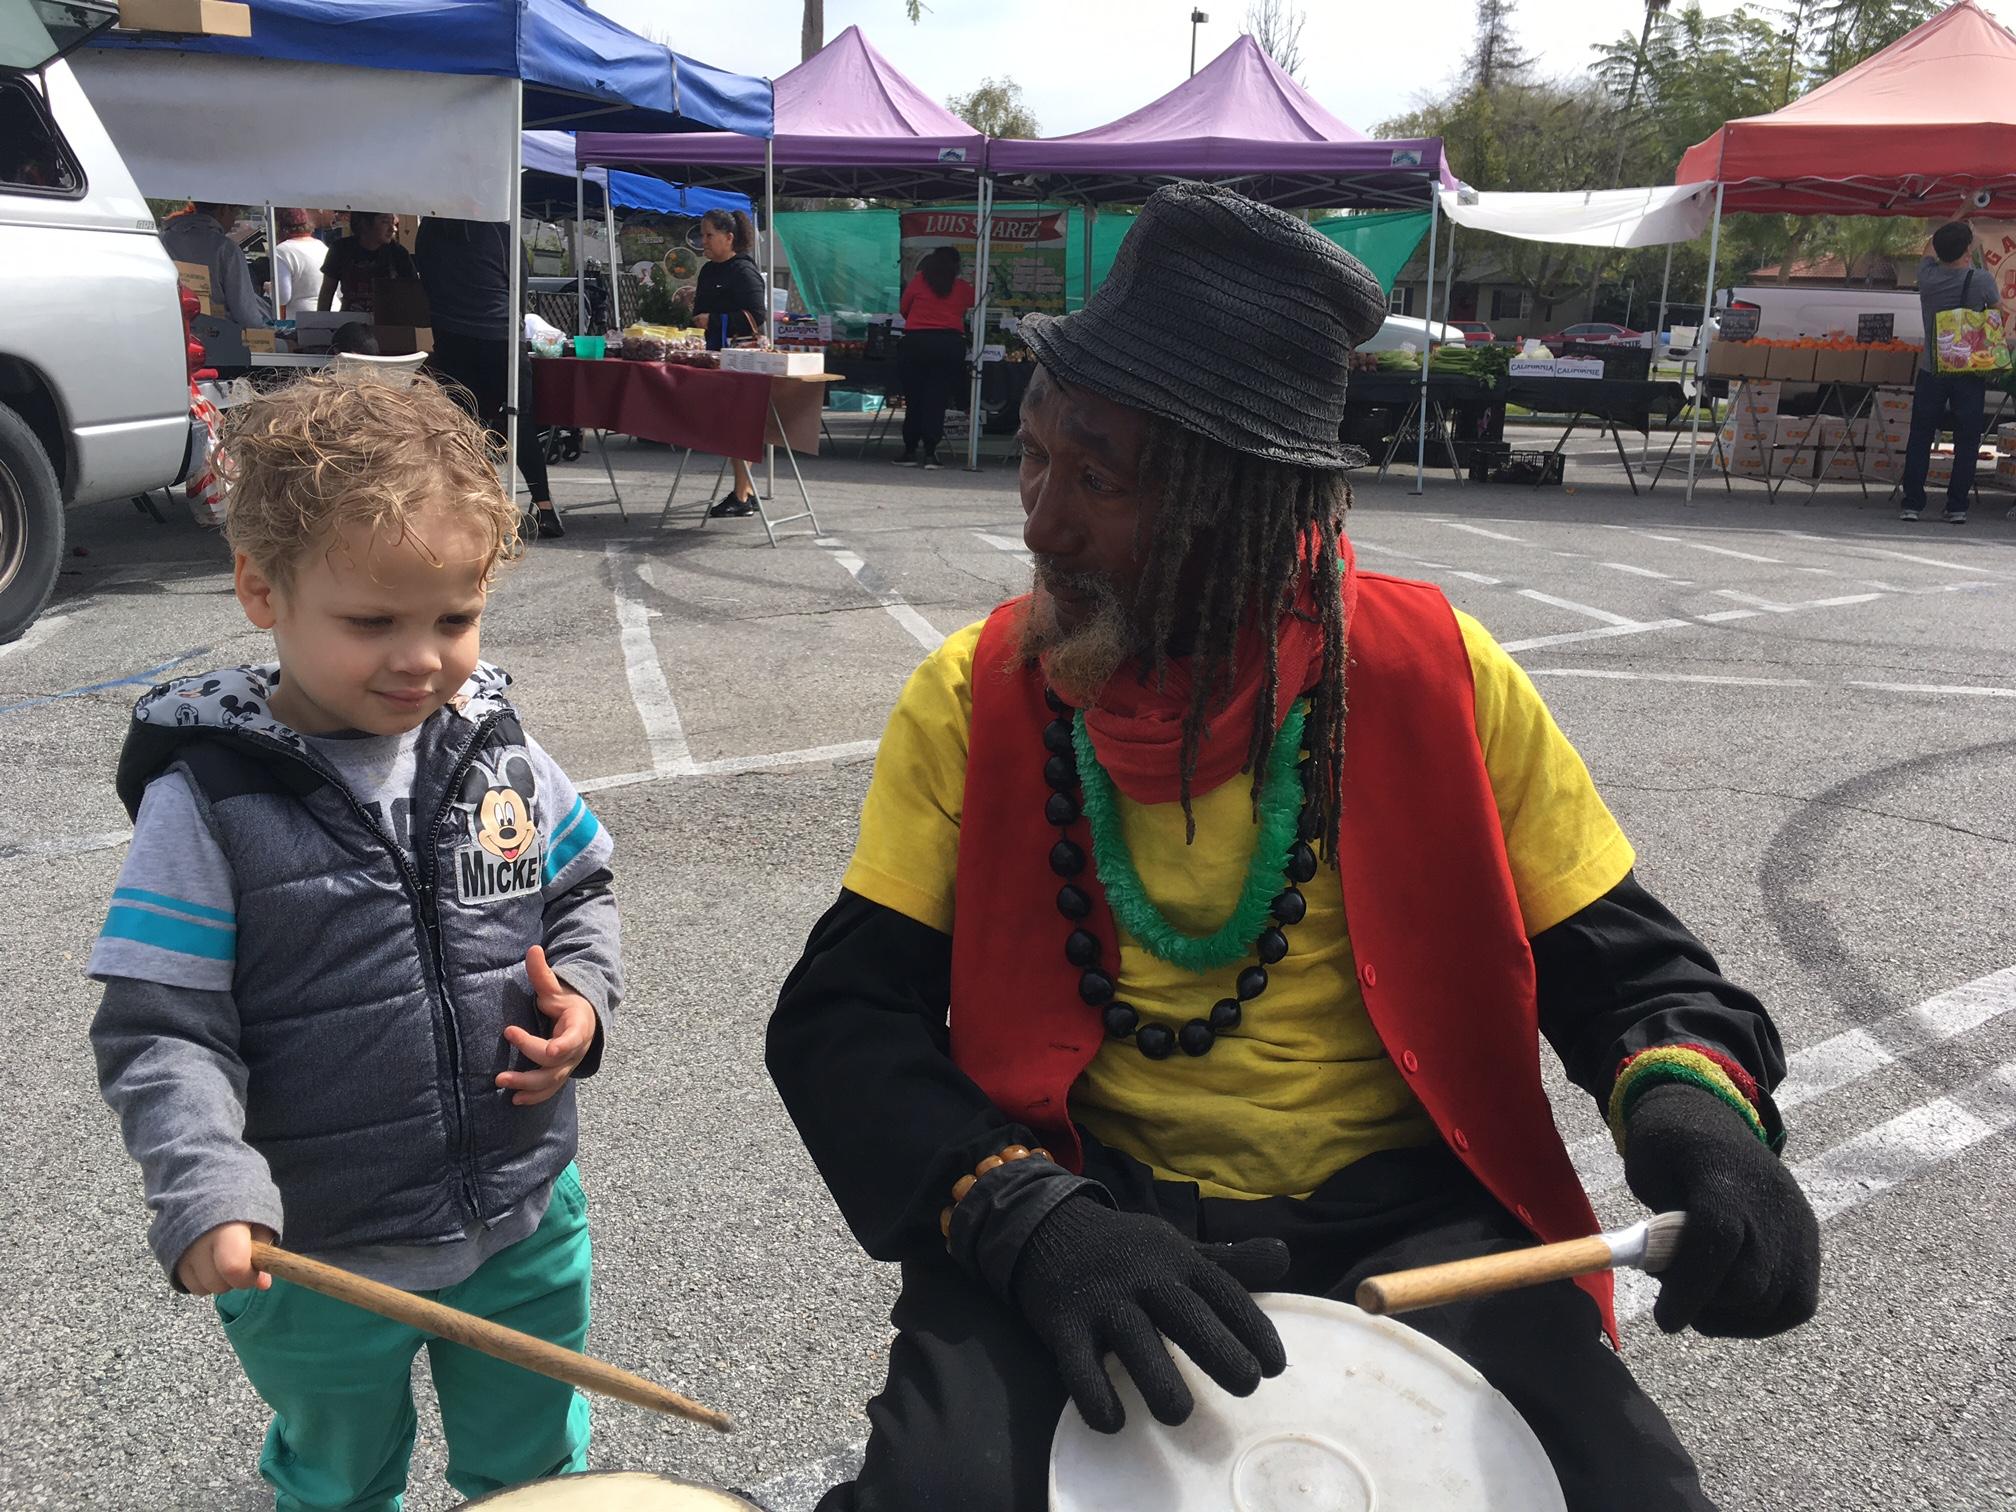 Alex then 3 at the Pasadena Saturday Farmers Market, enjoying the entertainment.